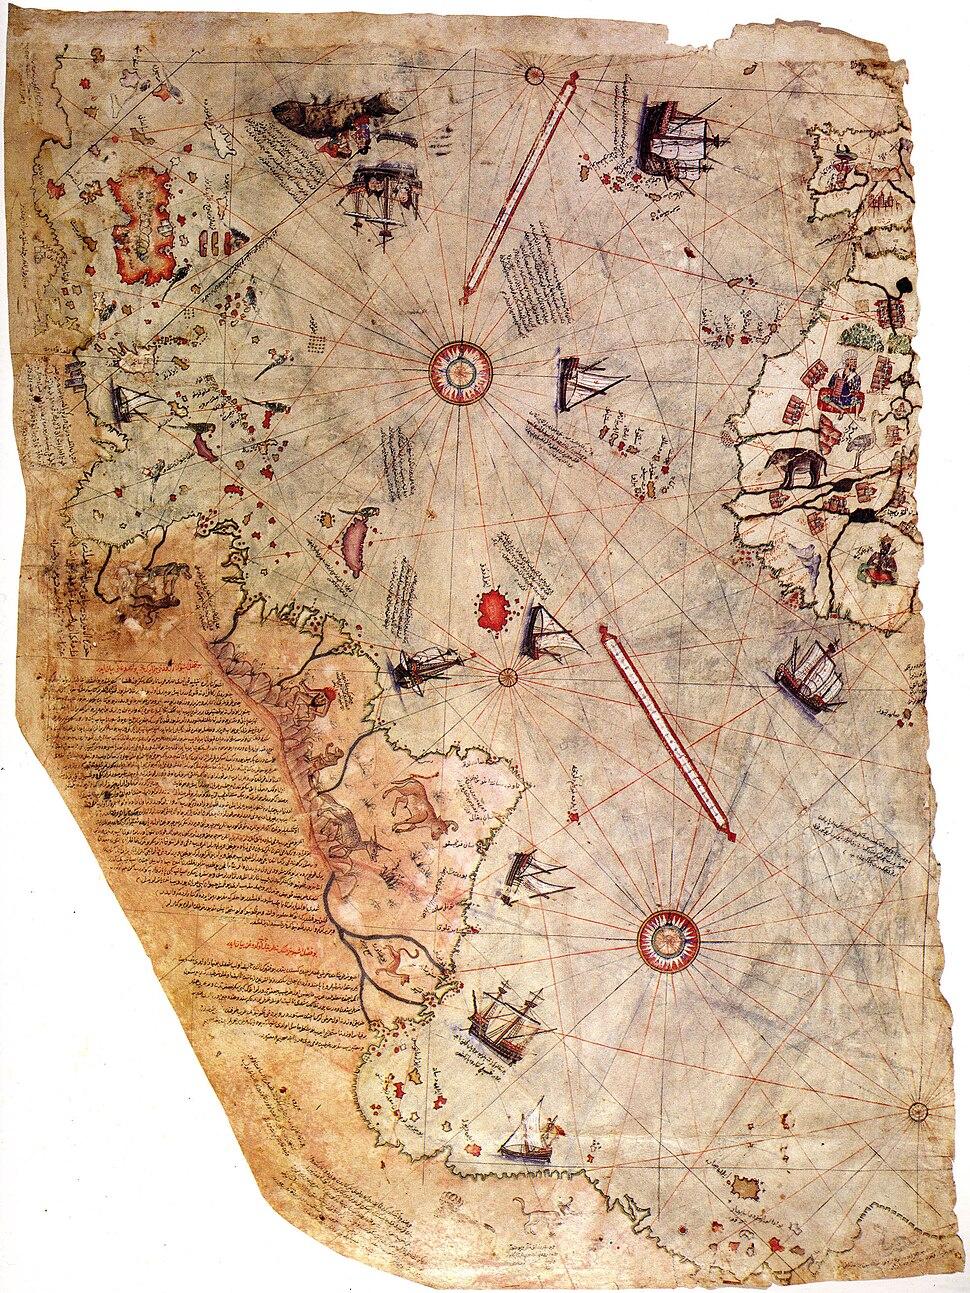 Piri reis world map 01